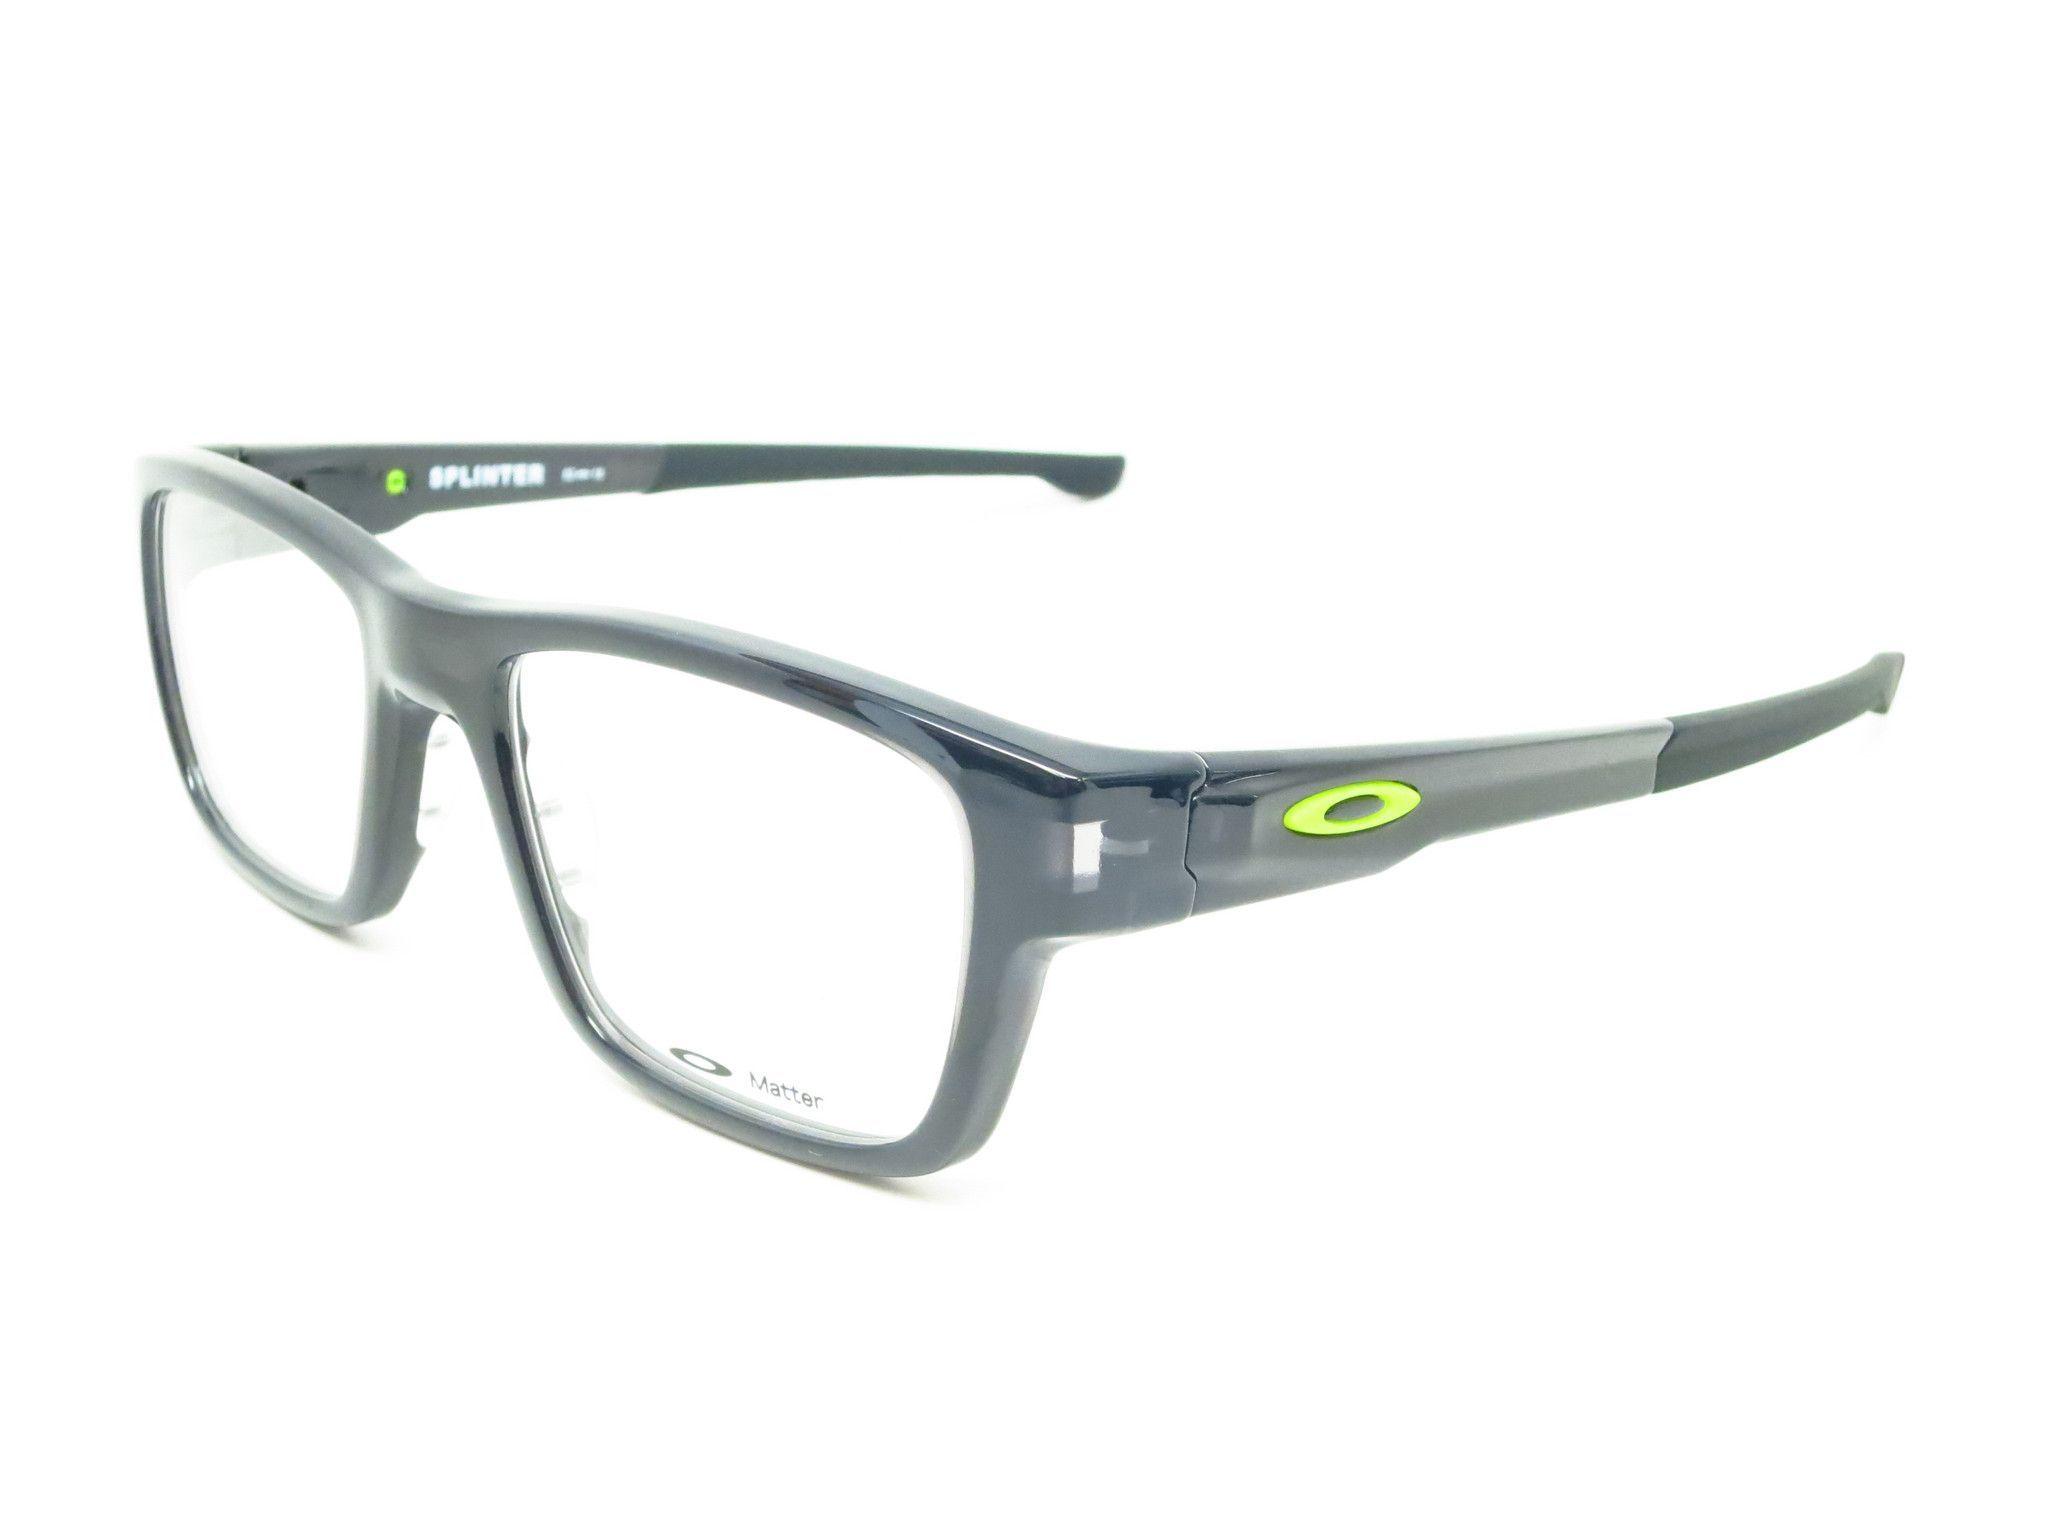 b940d8419b Oakley Splinter OX8077-0452 Black Ink   Retina Burn Eyeglasses Oakley  Glasses Frames